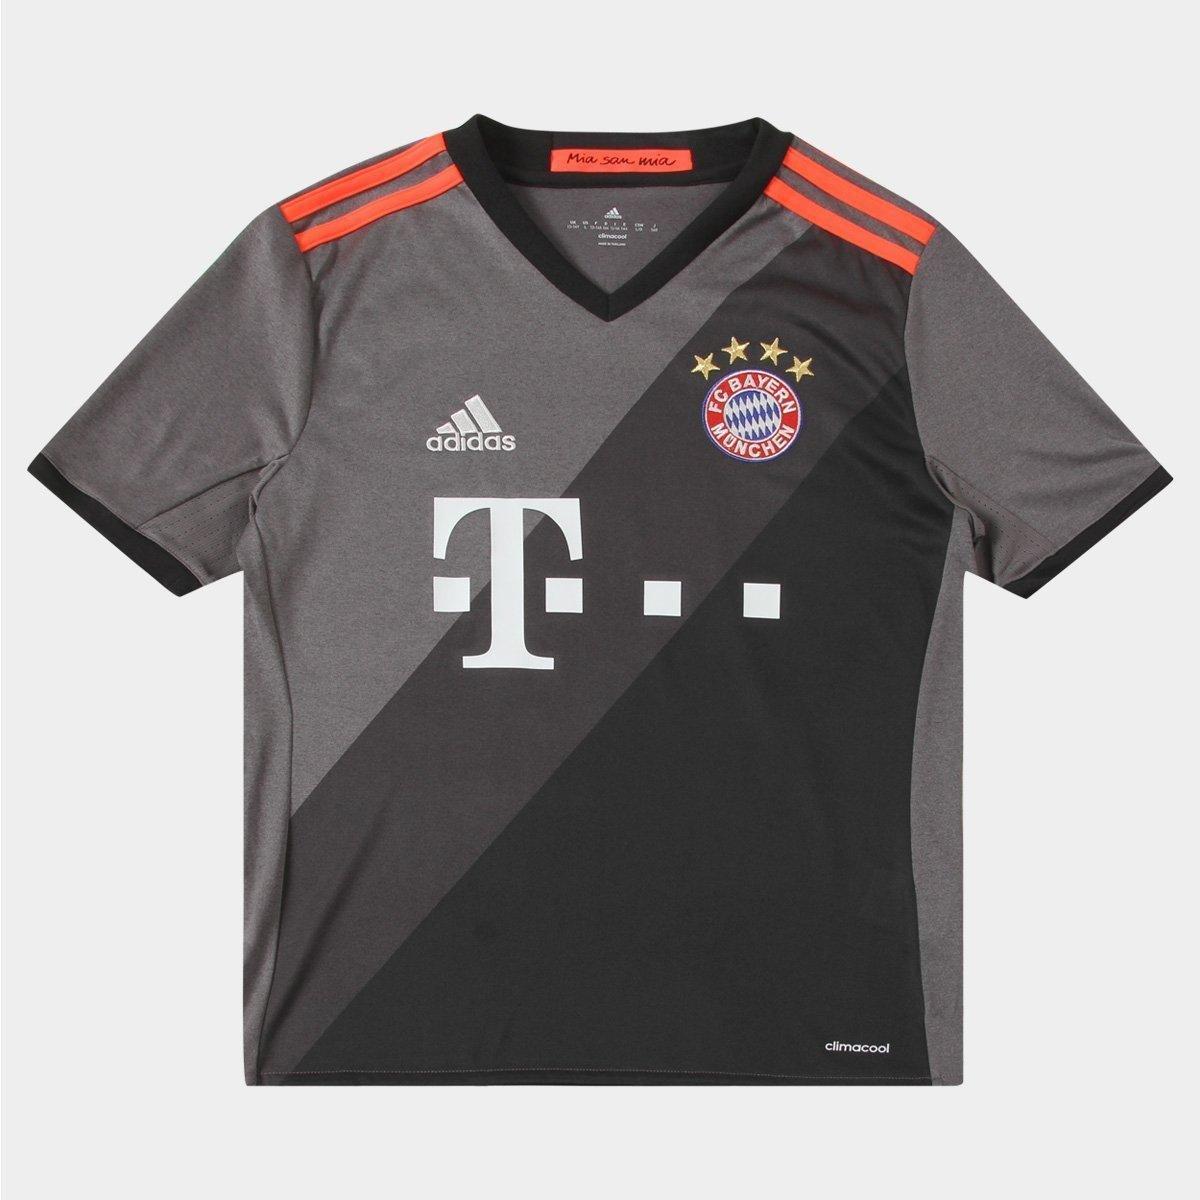 ad623d688bf06 Camisa Bayern de Munique Infantil Away 16 17 s nº - Torcedor Adidas -  Compre Agora